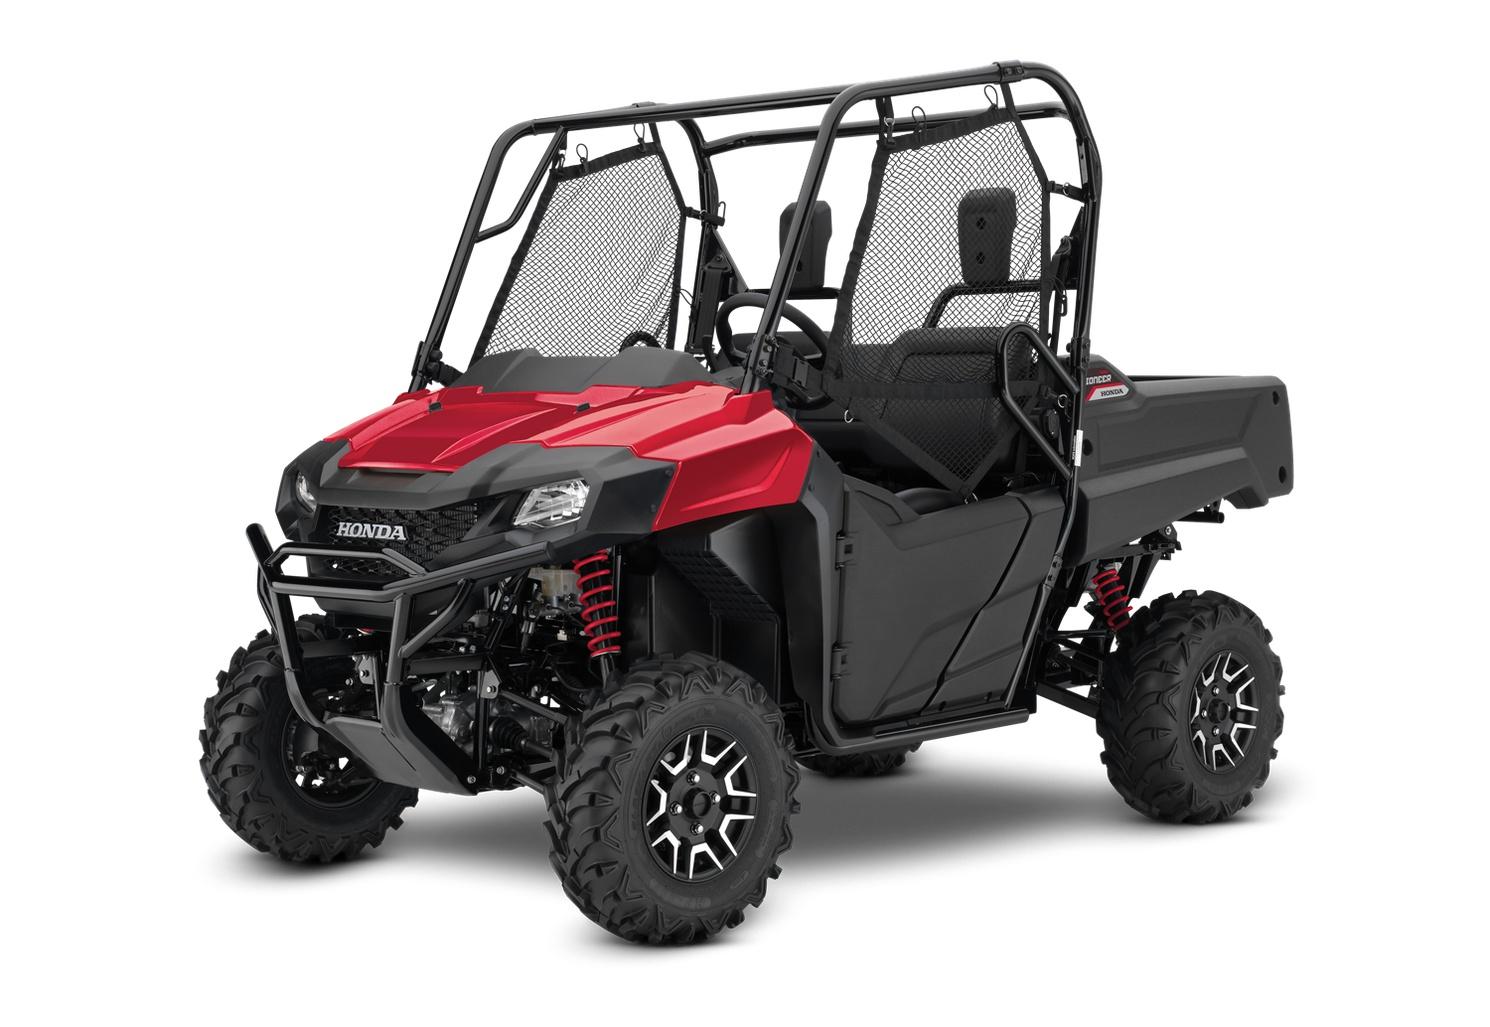 Honda pioneer 700 2021 - sxs7m2dm